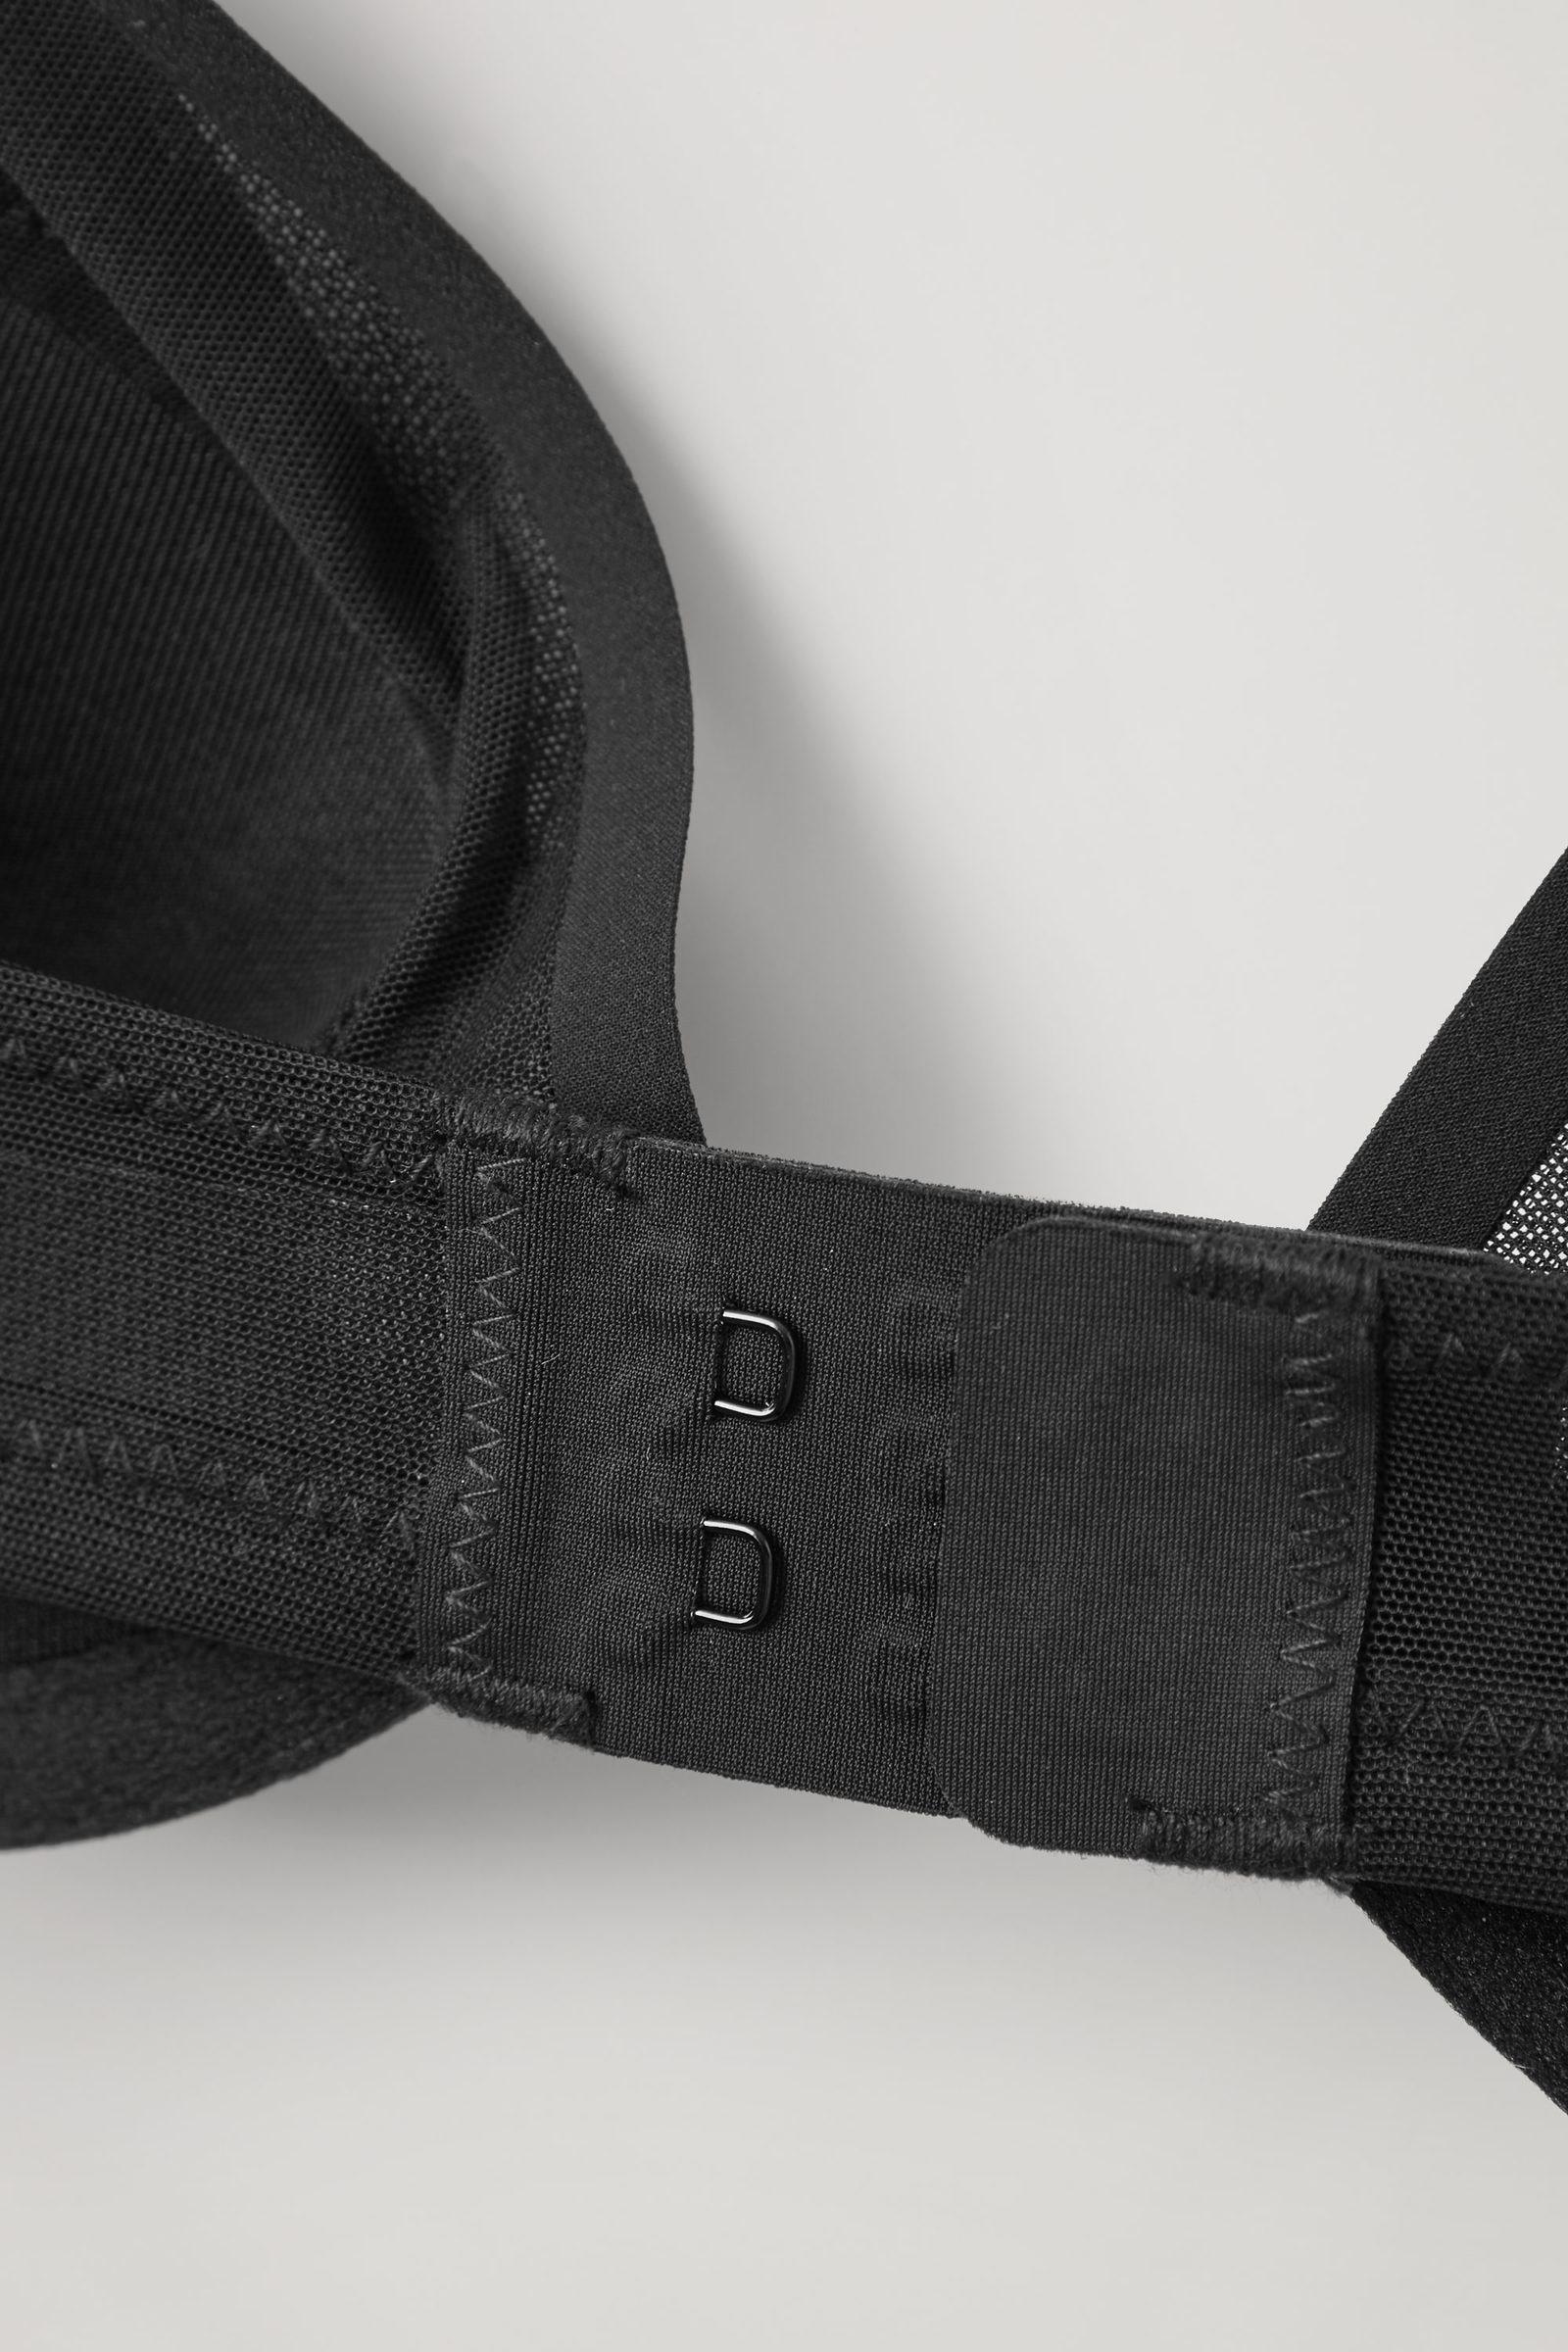 COS 리사이클 폴리아미드 메시 브라의 블랙컬러 Detail입니다.